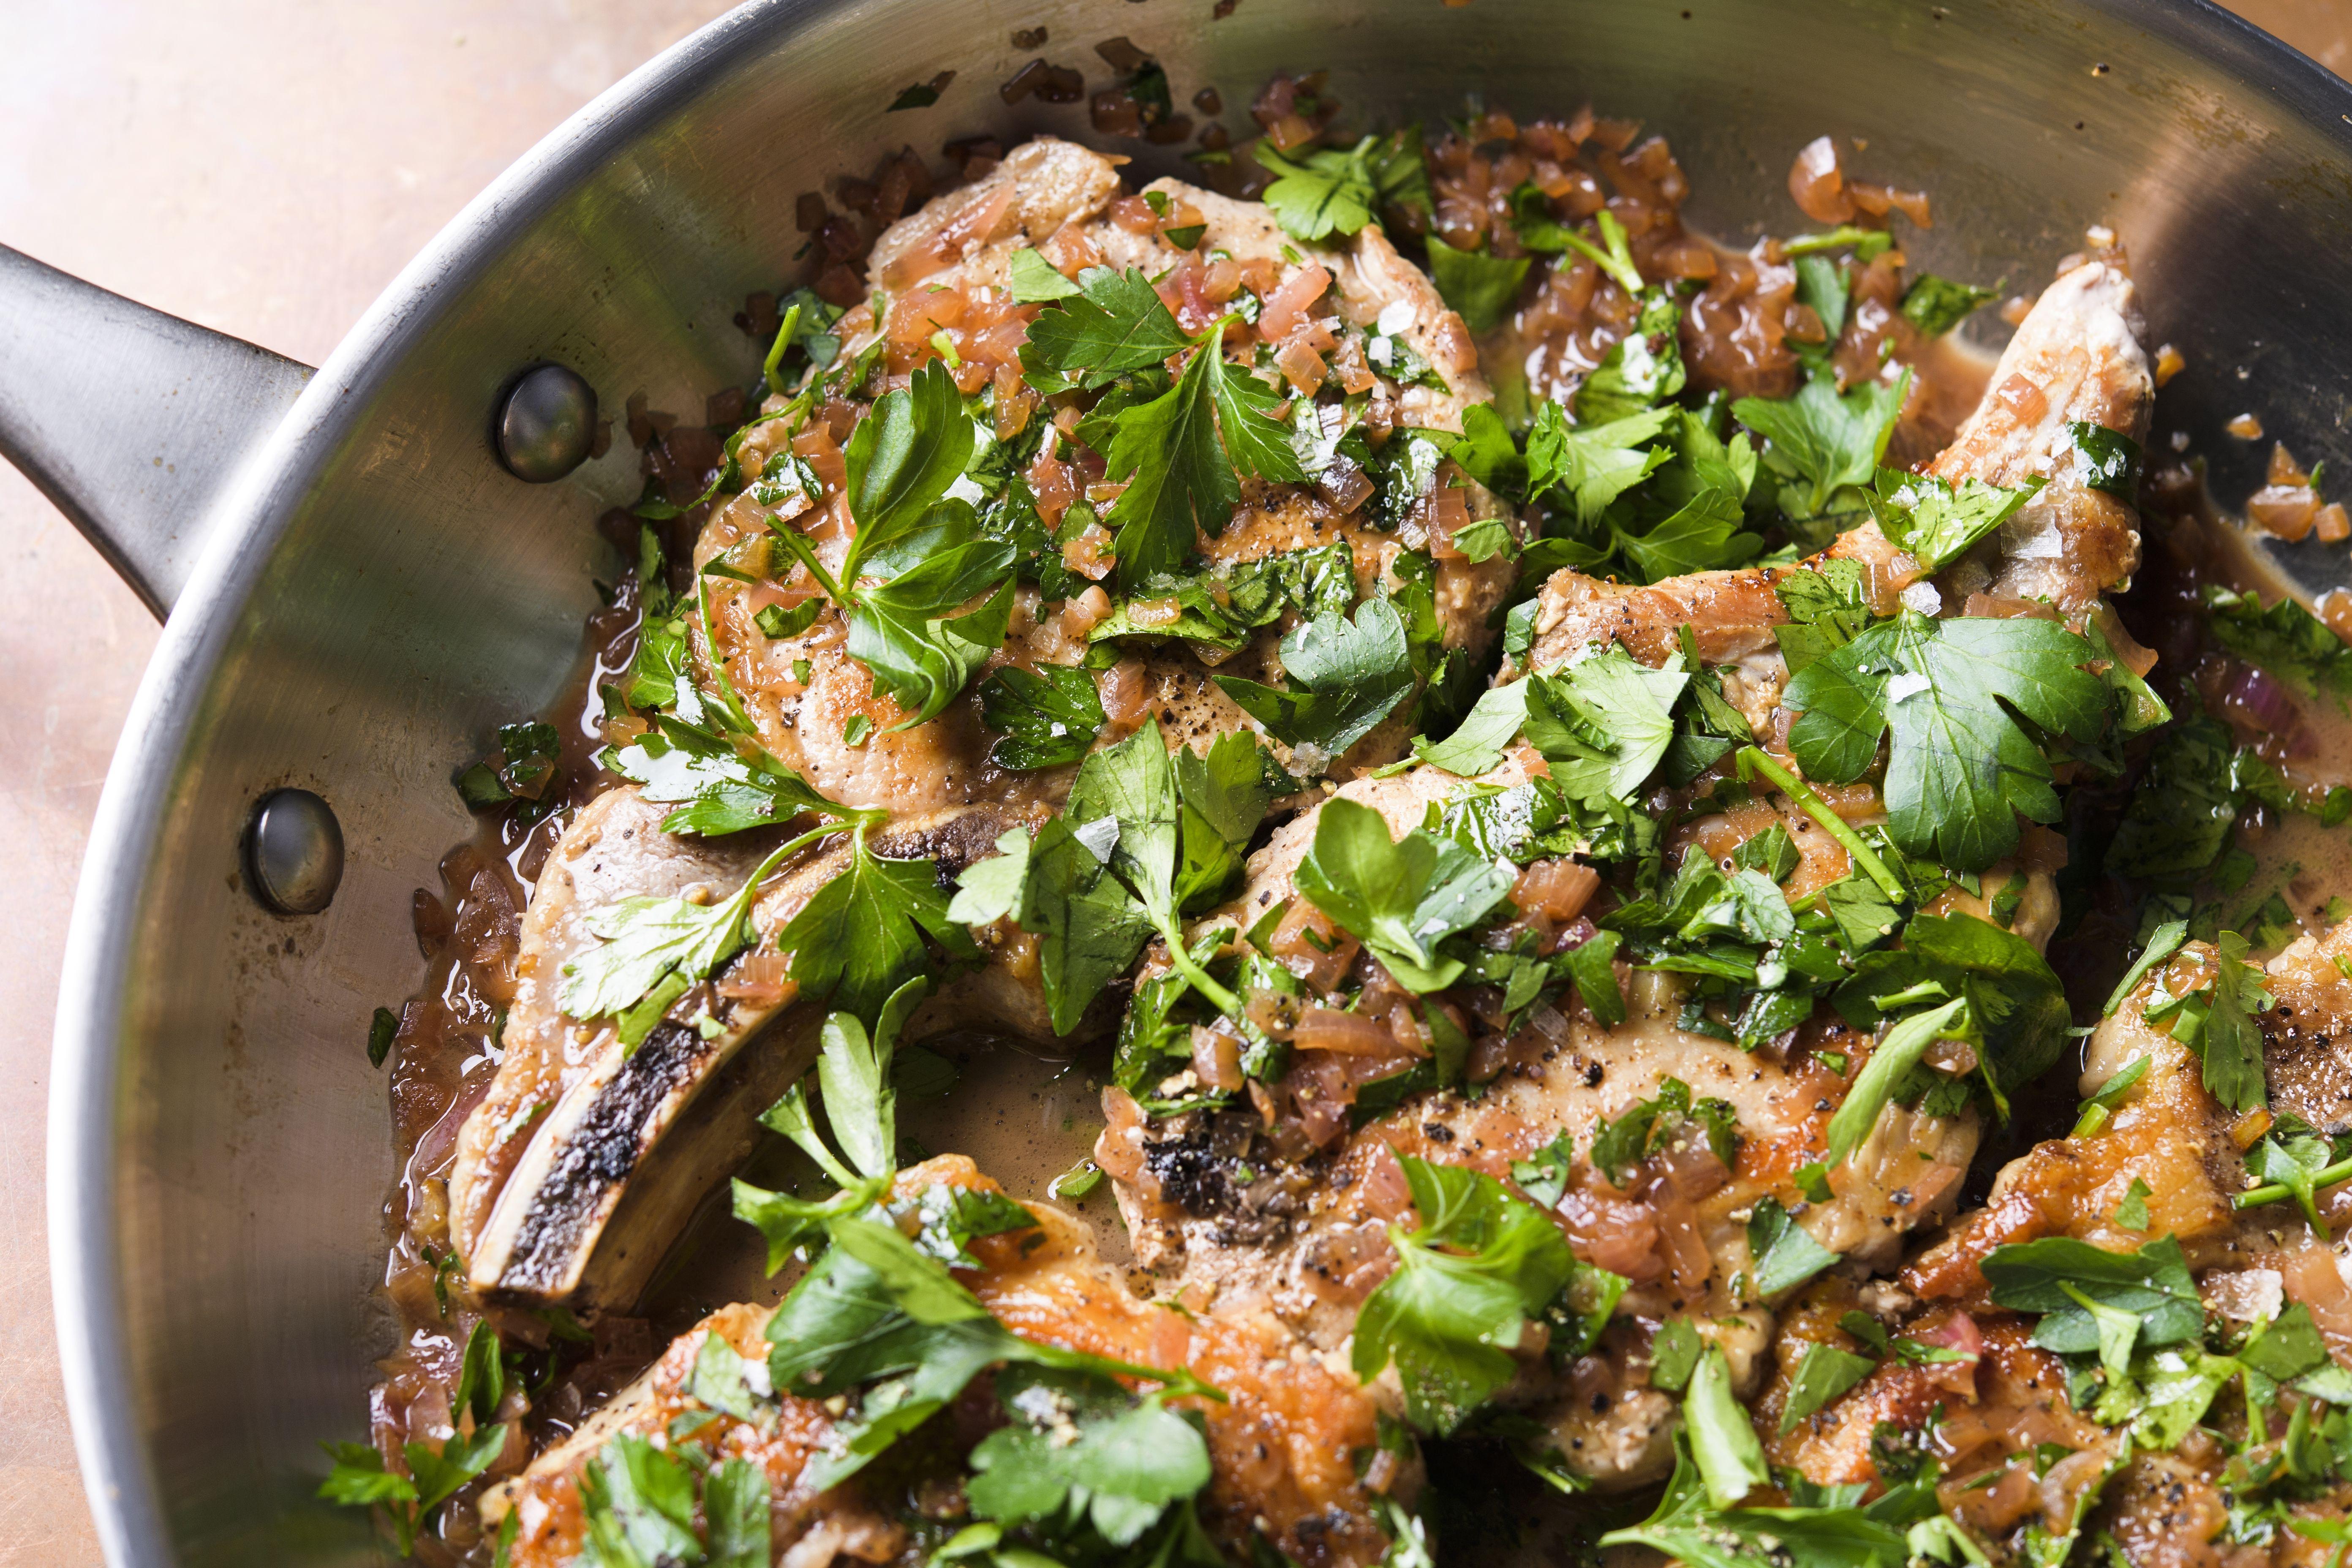 Italian Sweet-and-Sour Pork Chops